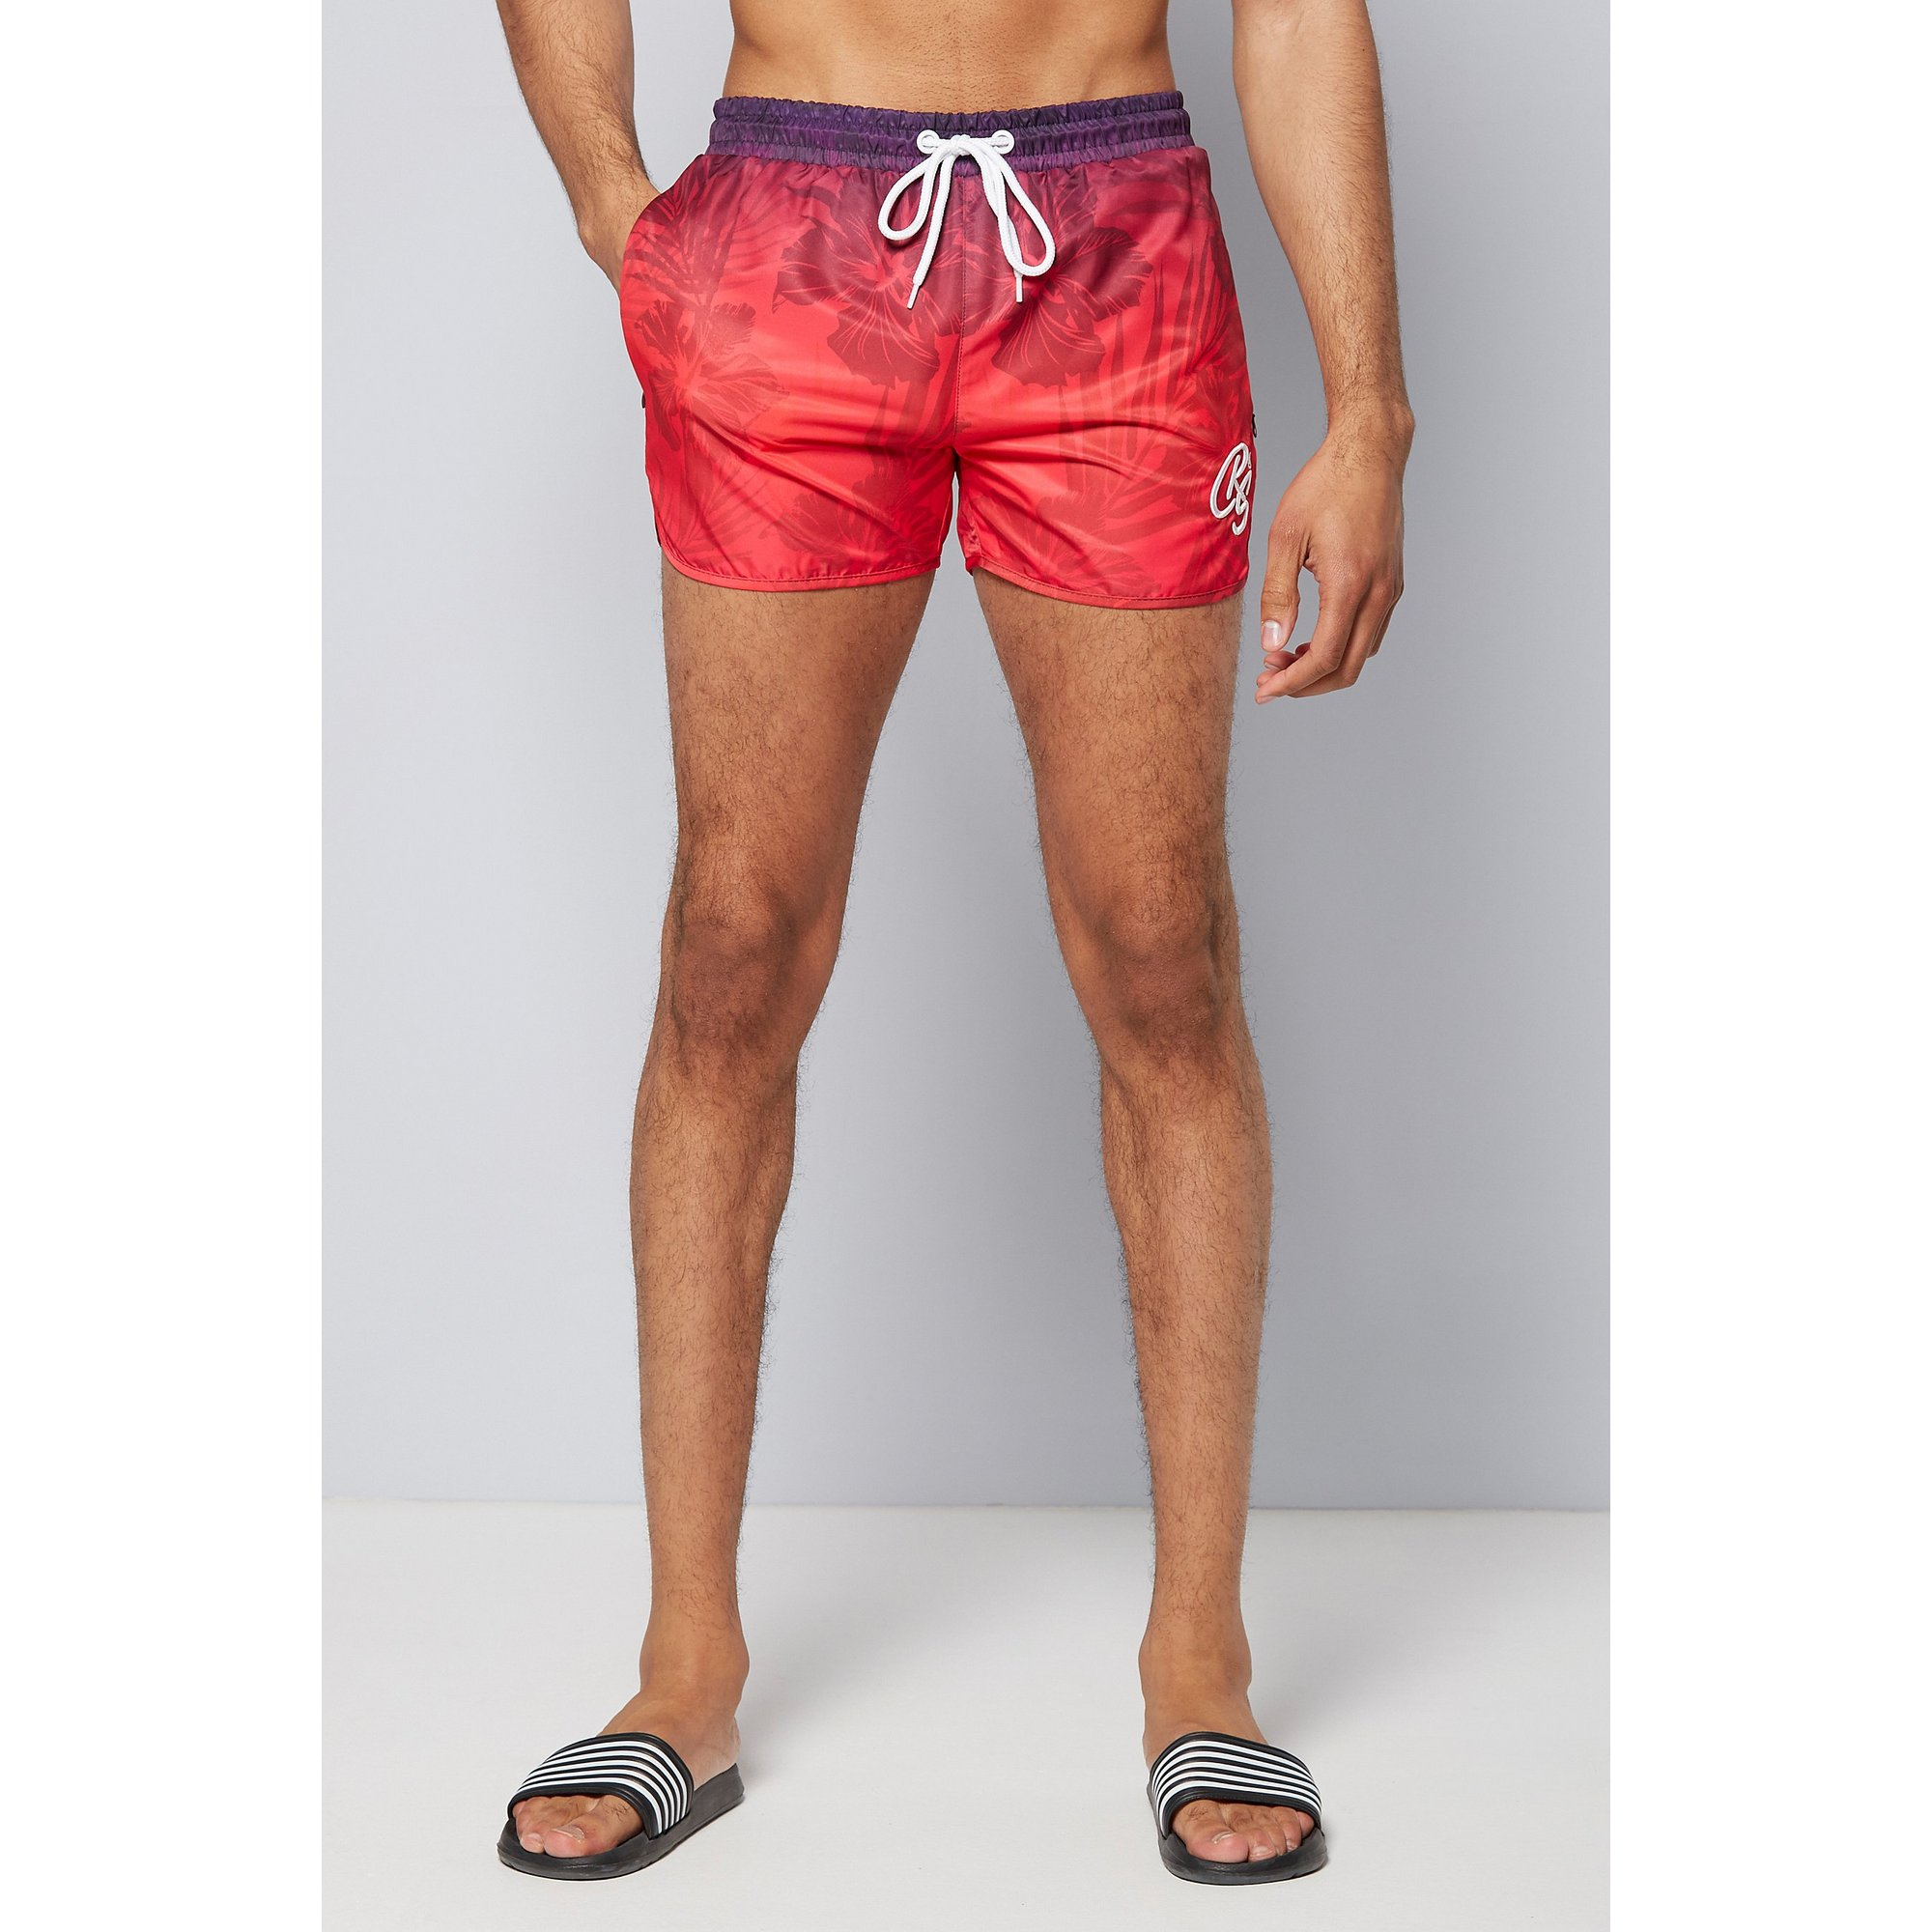 Image of Crosshatch Gradient Print Swim Shorts